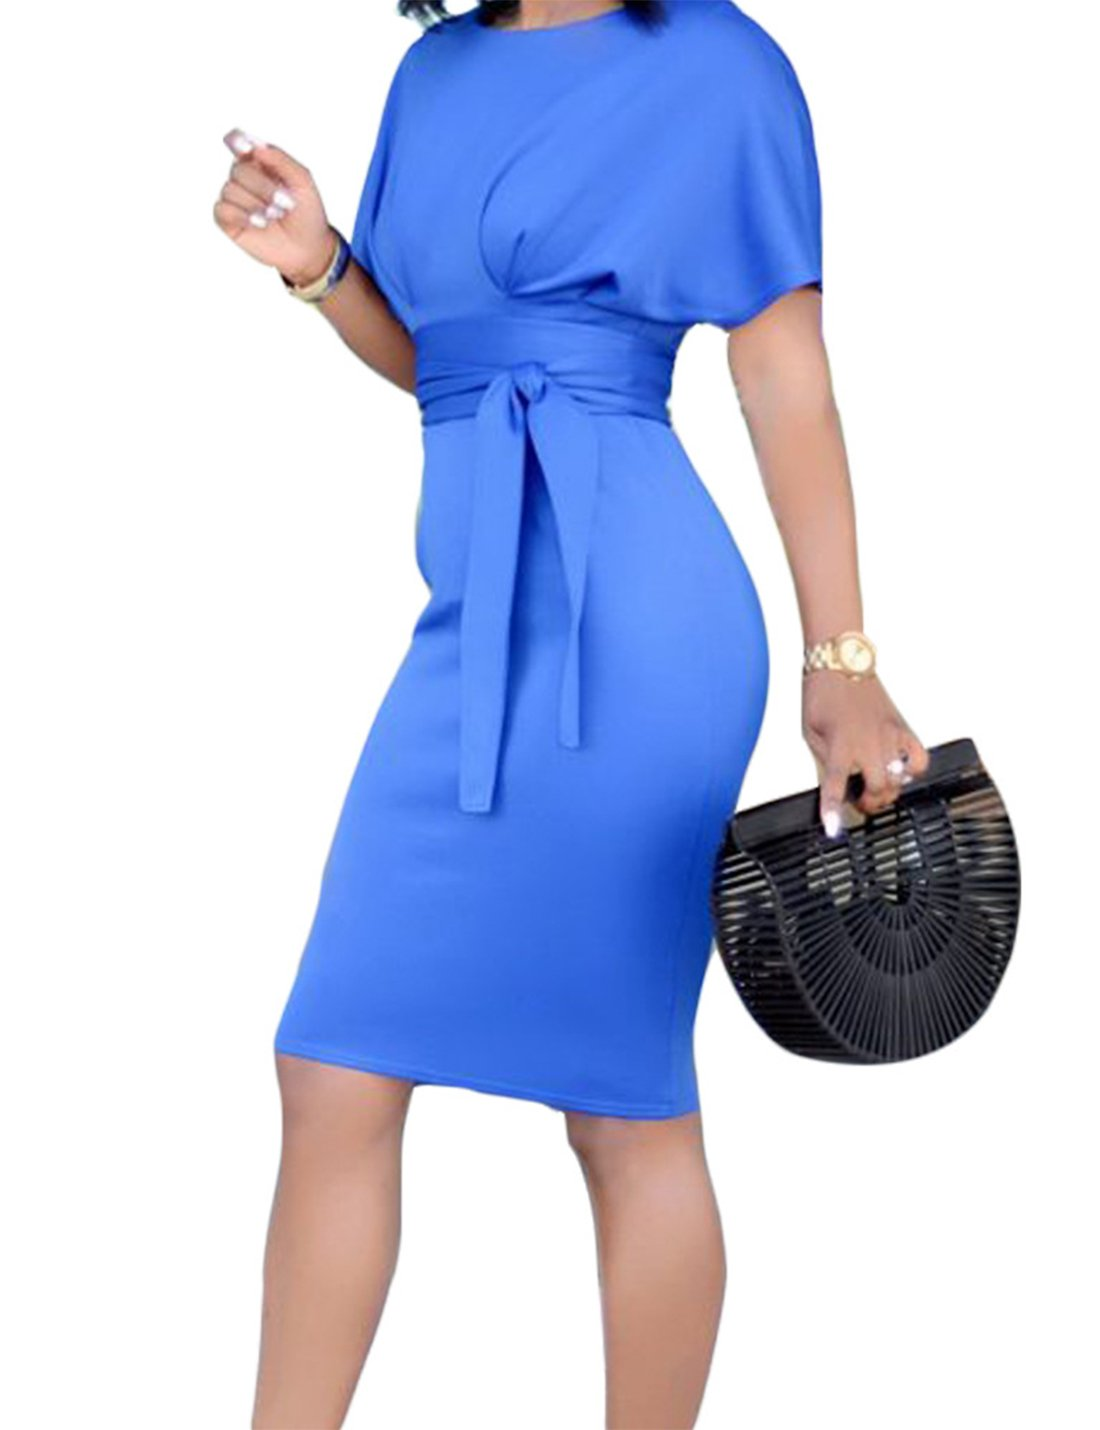 Women Business Wear to Work Short Sleeve Floral Print Bodyon Pencil Dress Colorblock (Light Blue, 3XL)